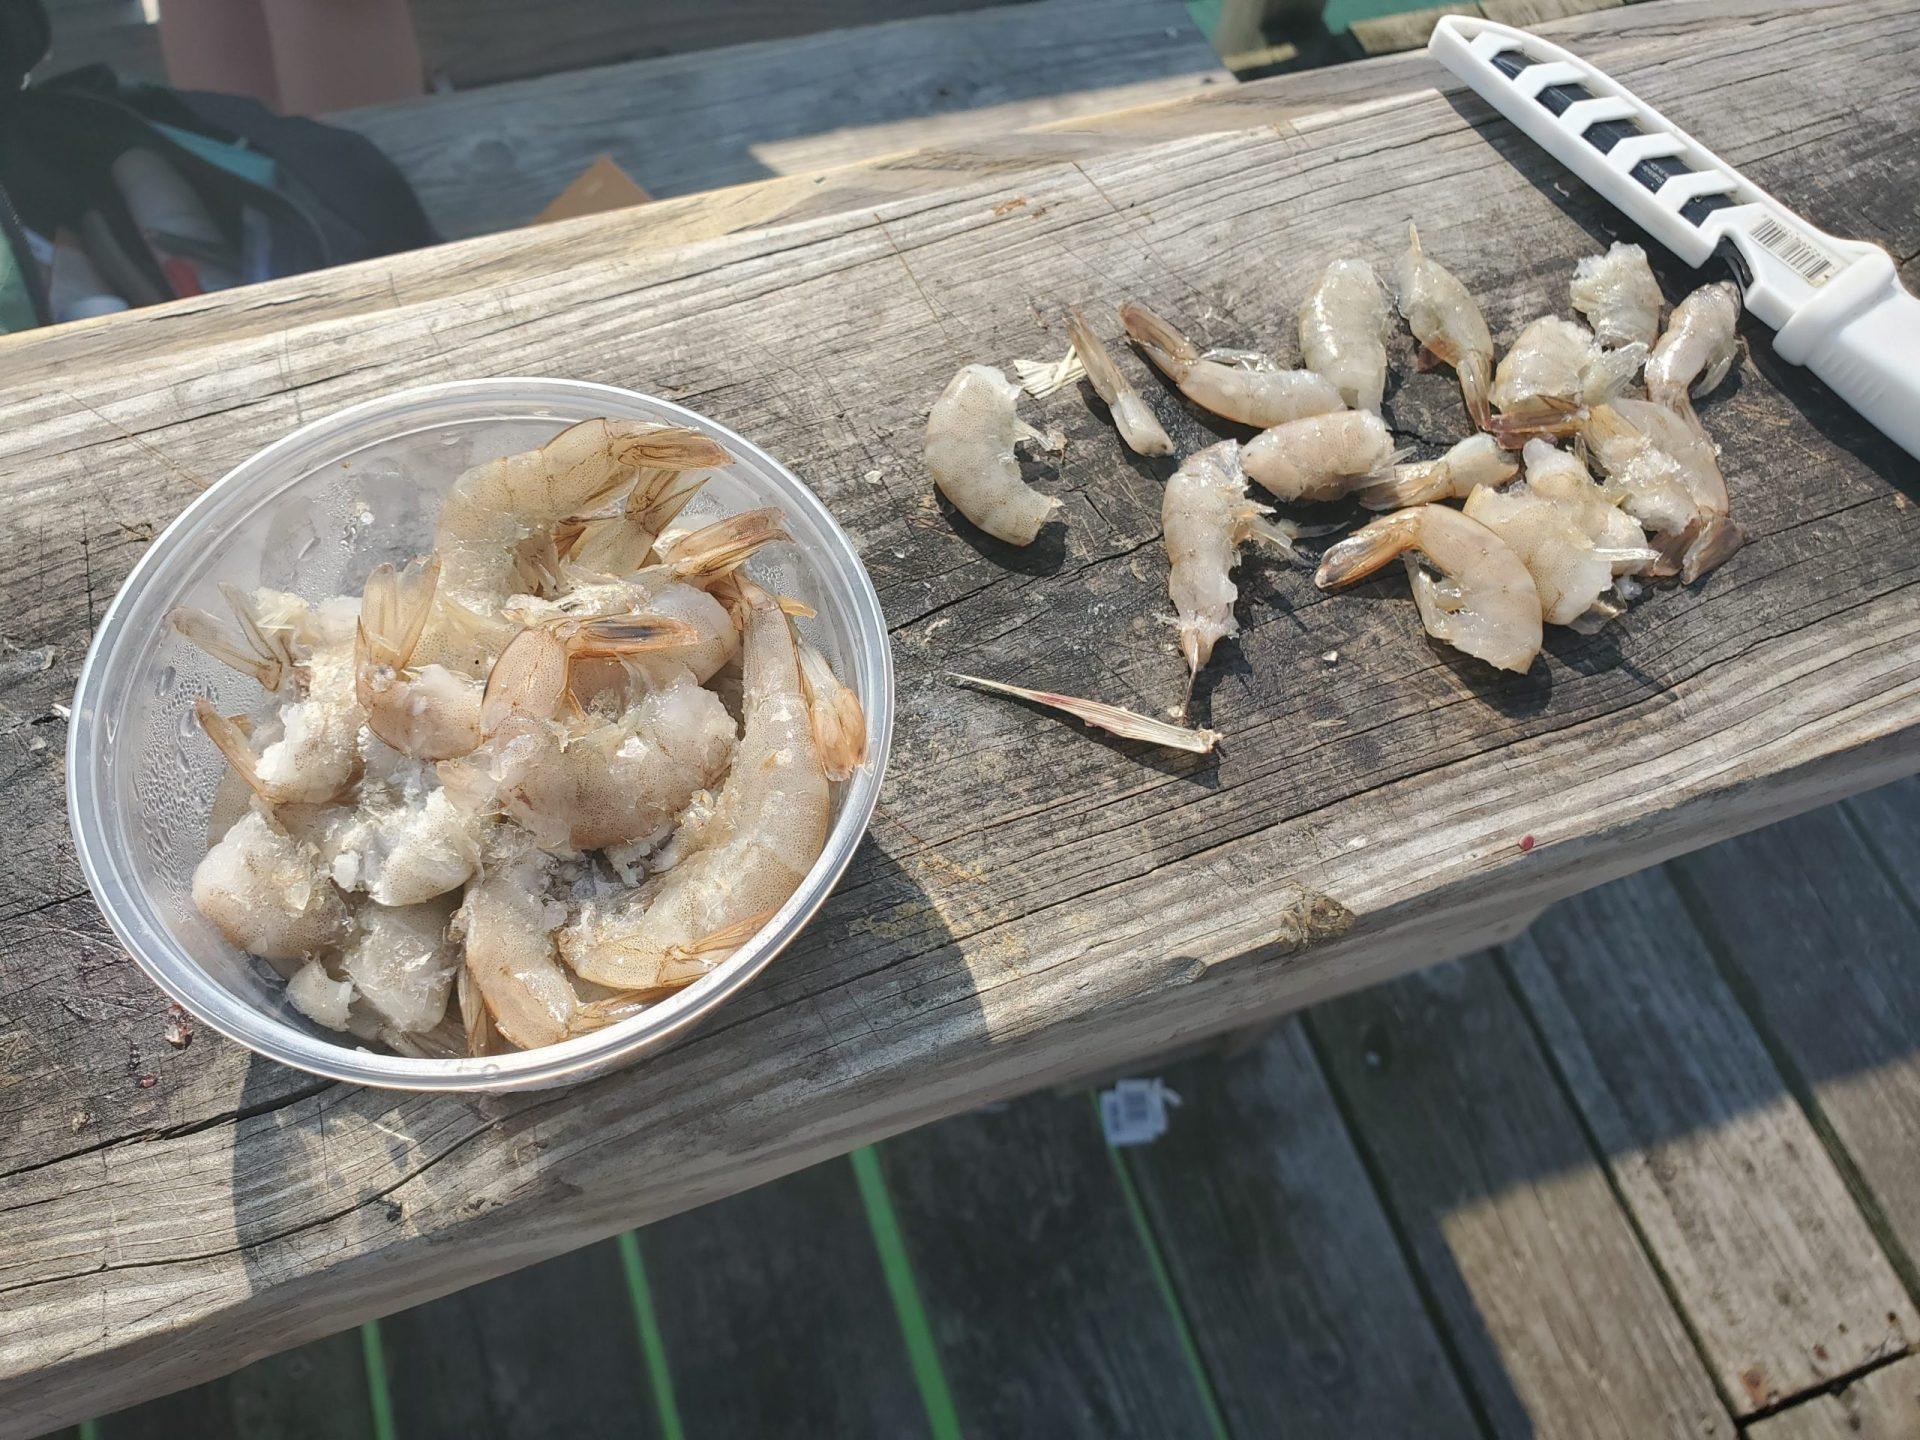 pier Atlantic Beach fish coastal environment habitat tourism economy hurricane risk